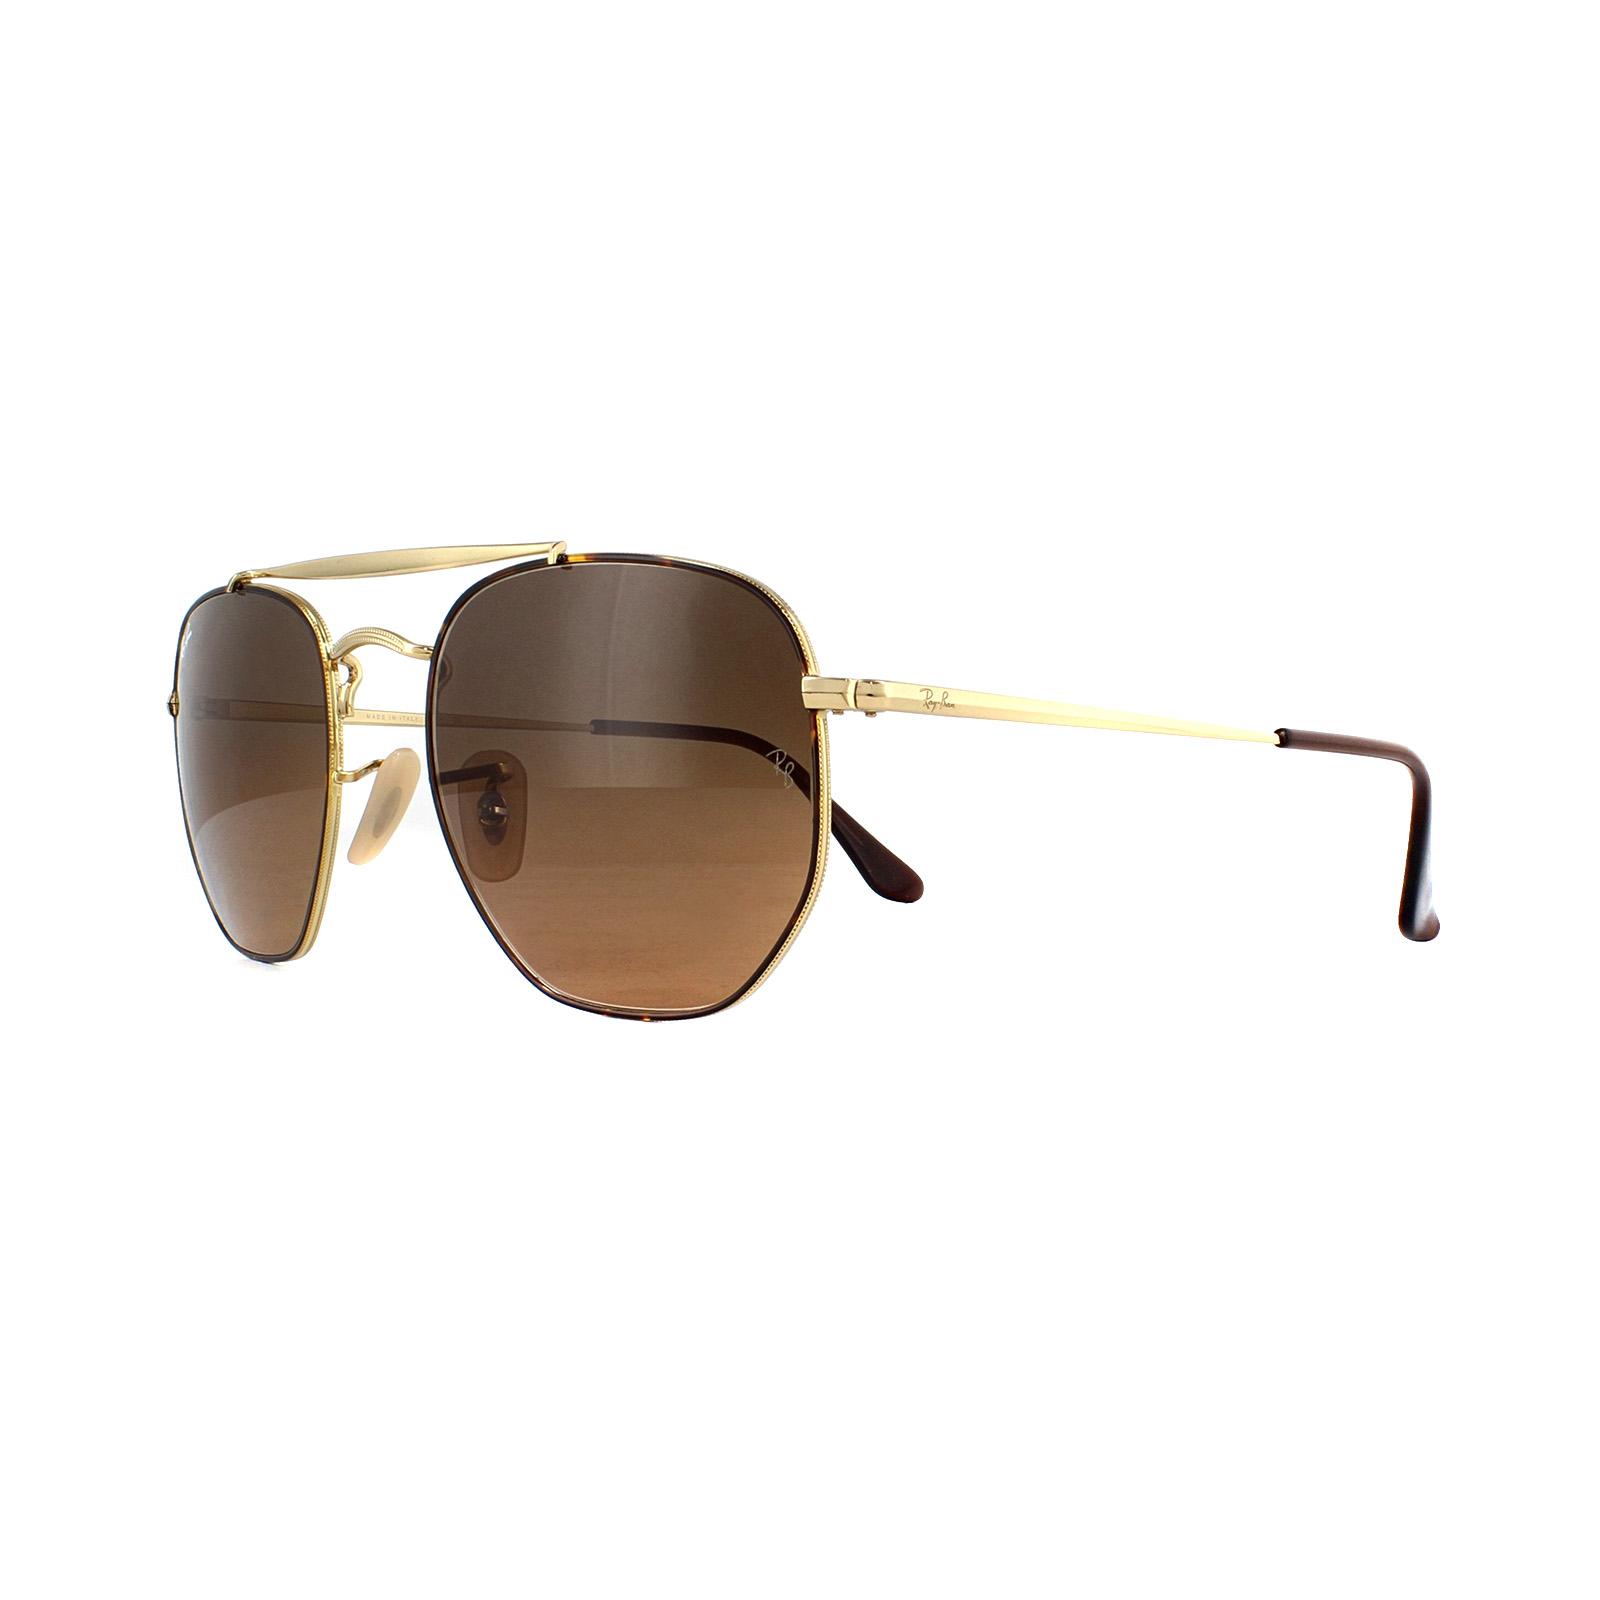 568e569dbe Sentinel Ray-Ban Sunglasses Marshal 3648 910443 Tortoise Gold Brown Gradient